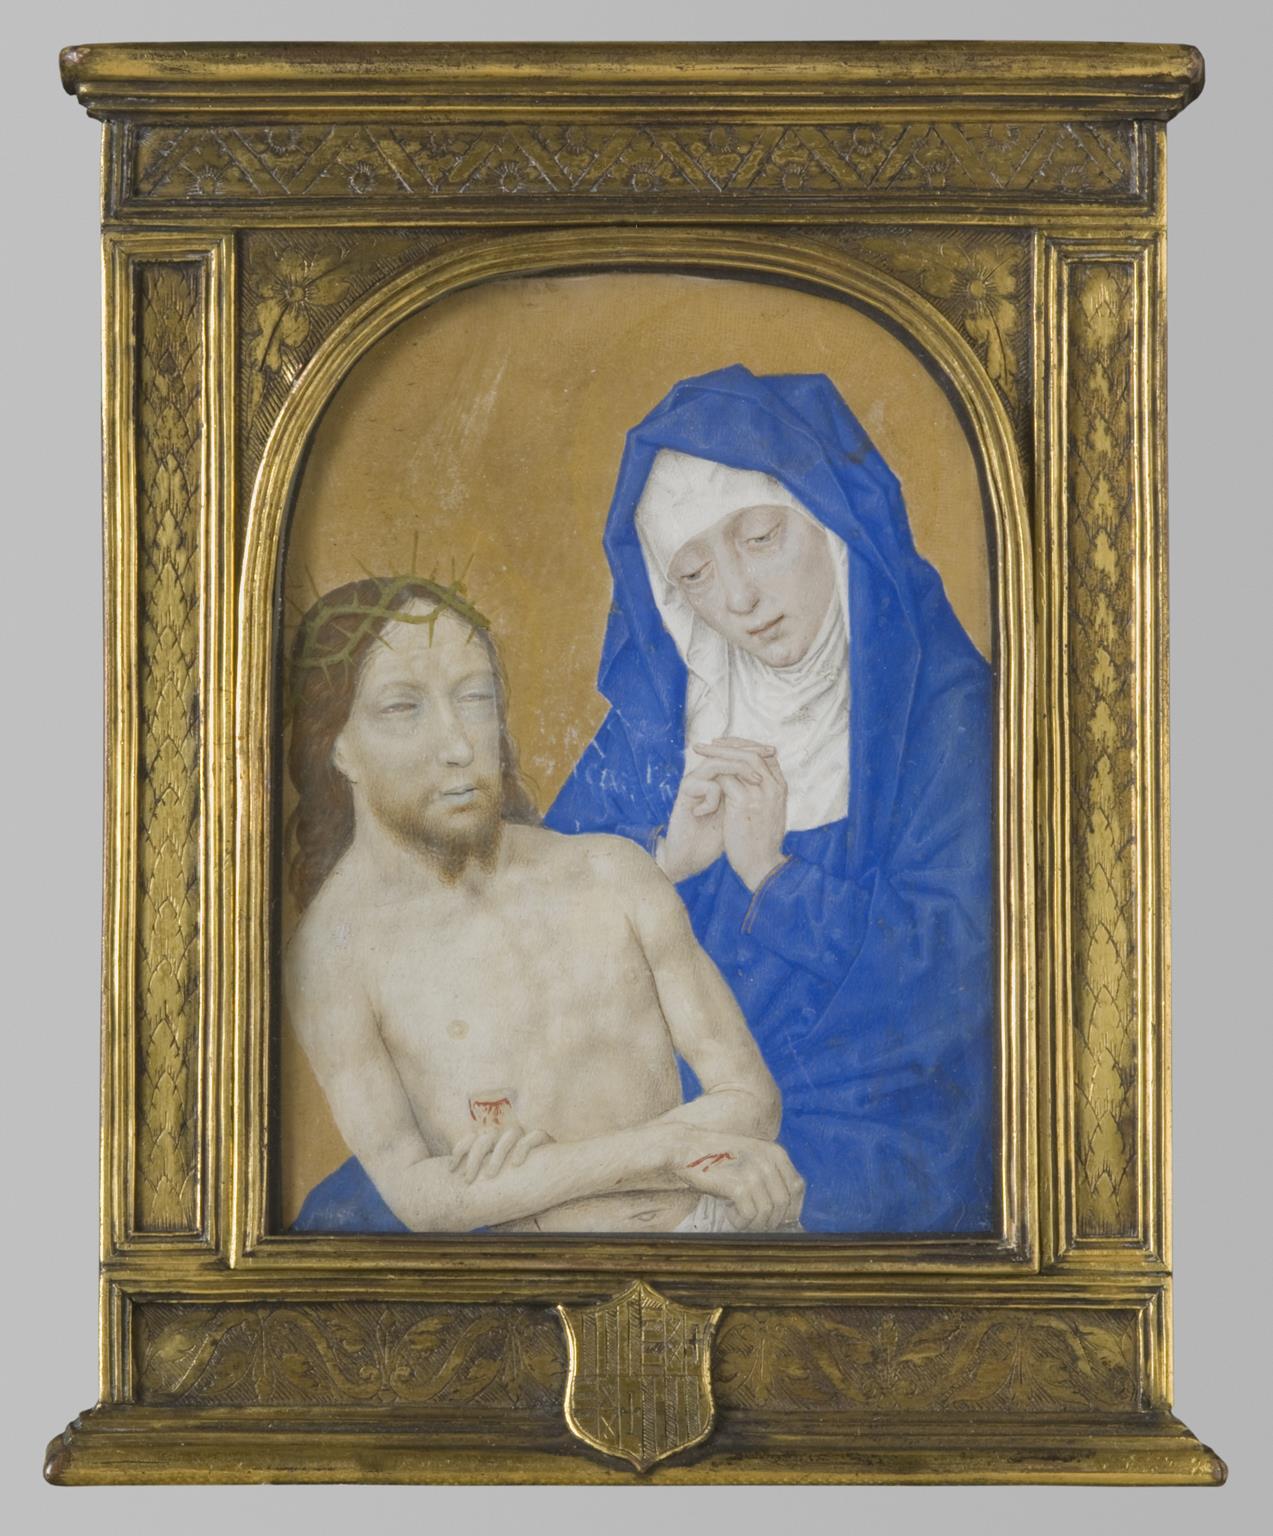 Fig. 6: Simon Marmion (1420-1489), Pietà , late 15th century, John G. Johnson Collection, 1917, Philadelphia Museum of Art